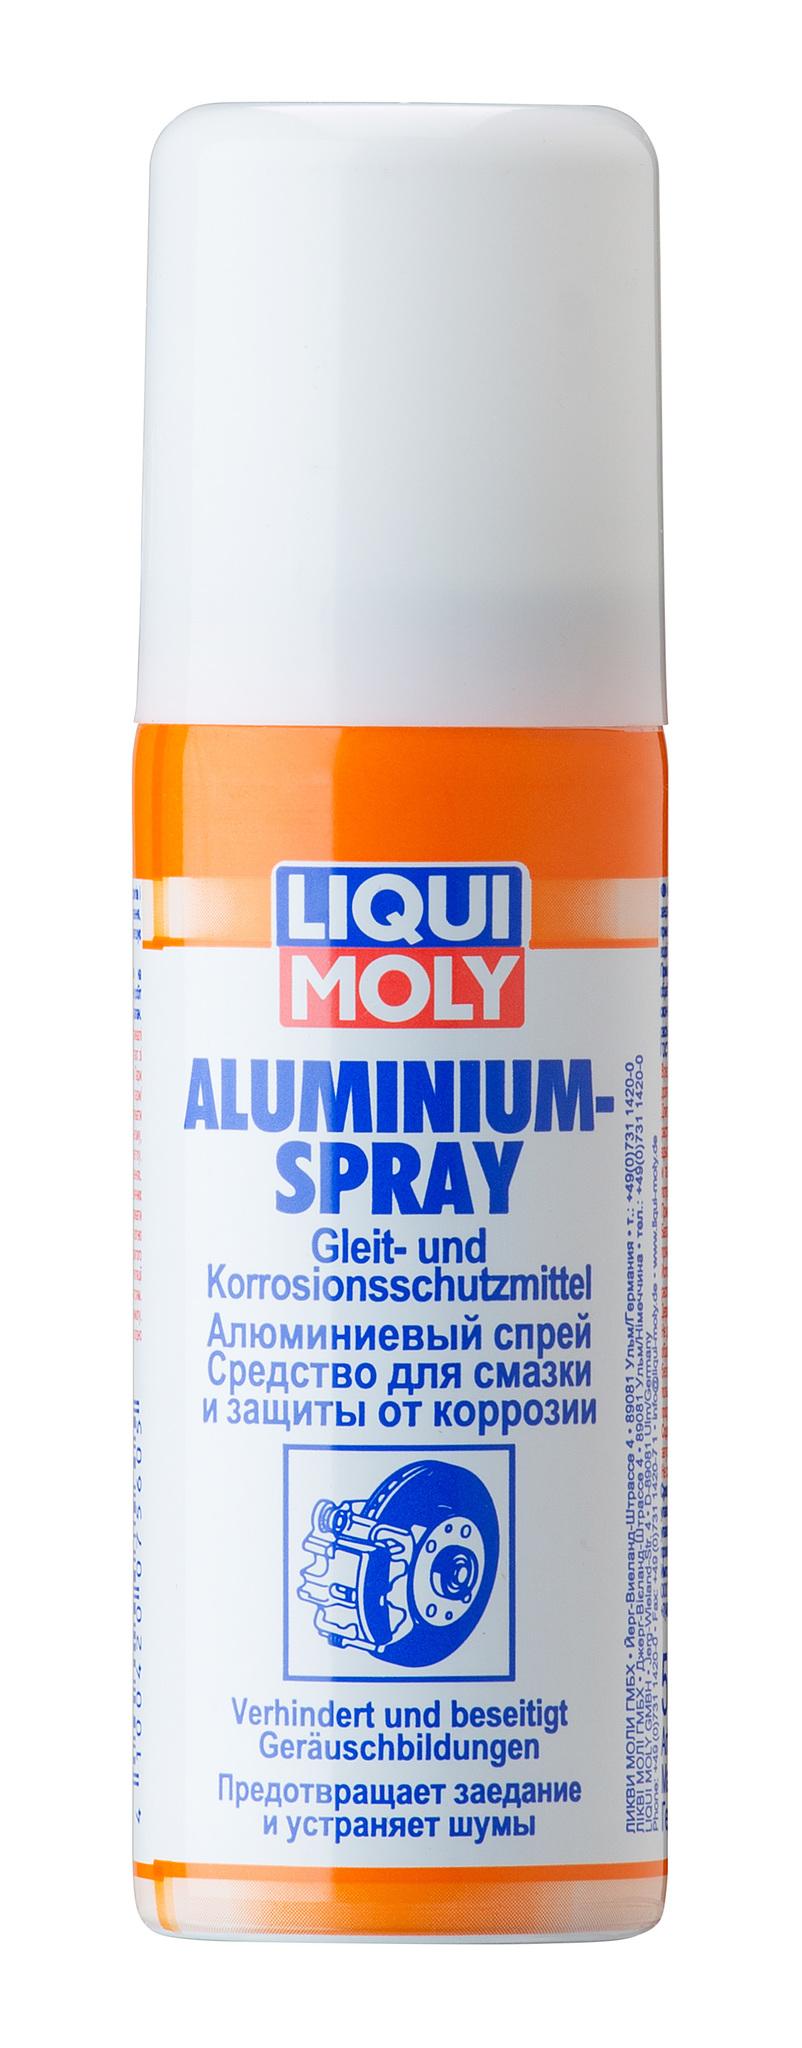 Liqui Moly Aluminium Spray Алюминиевый спрей